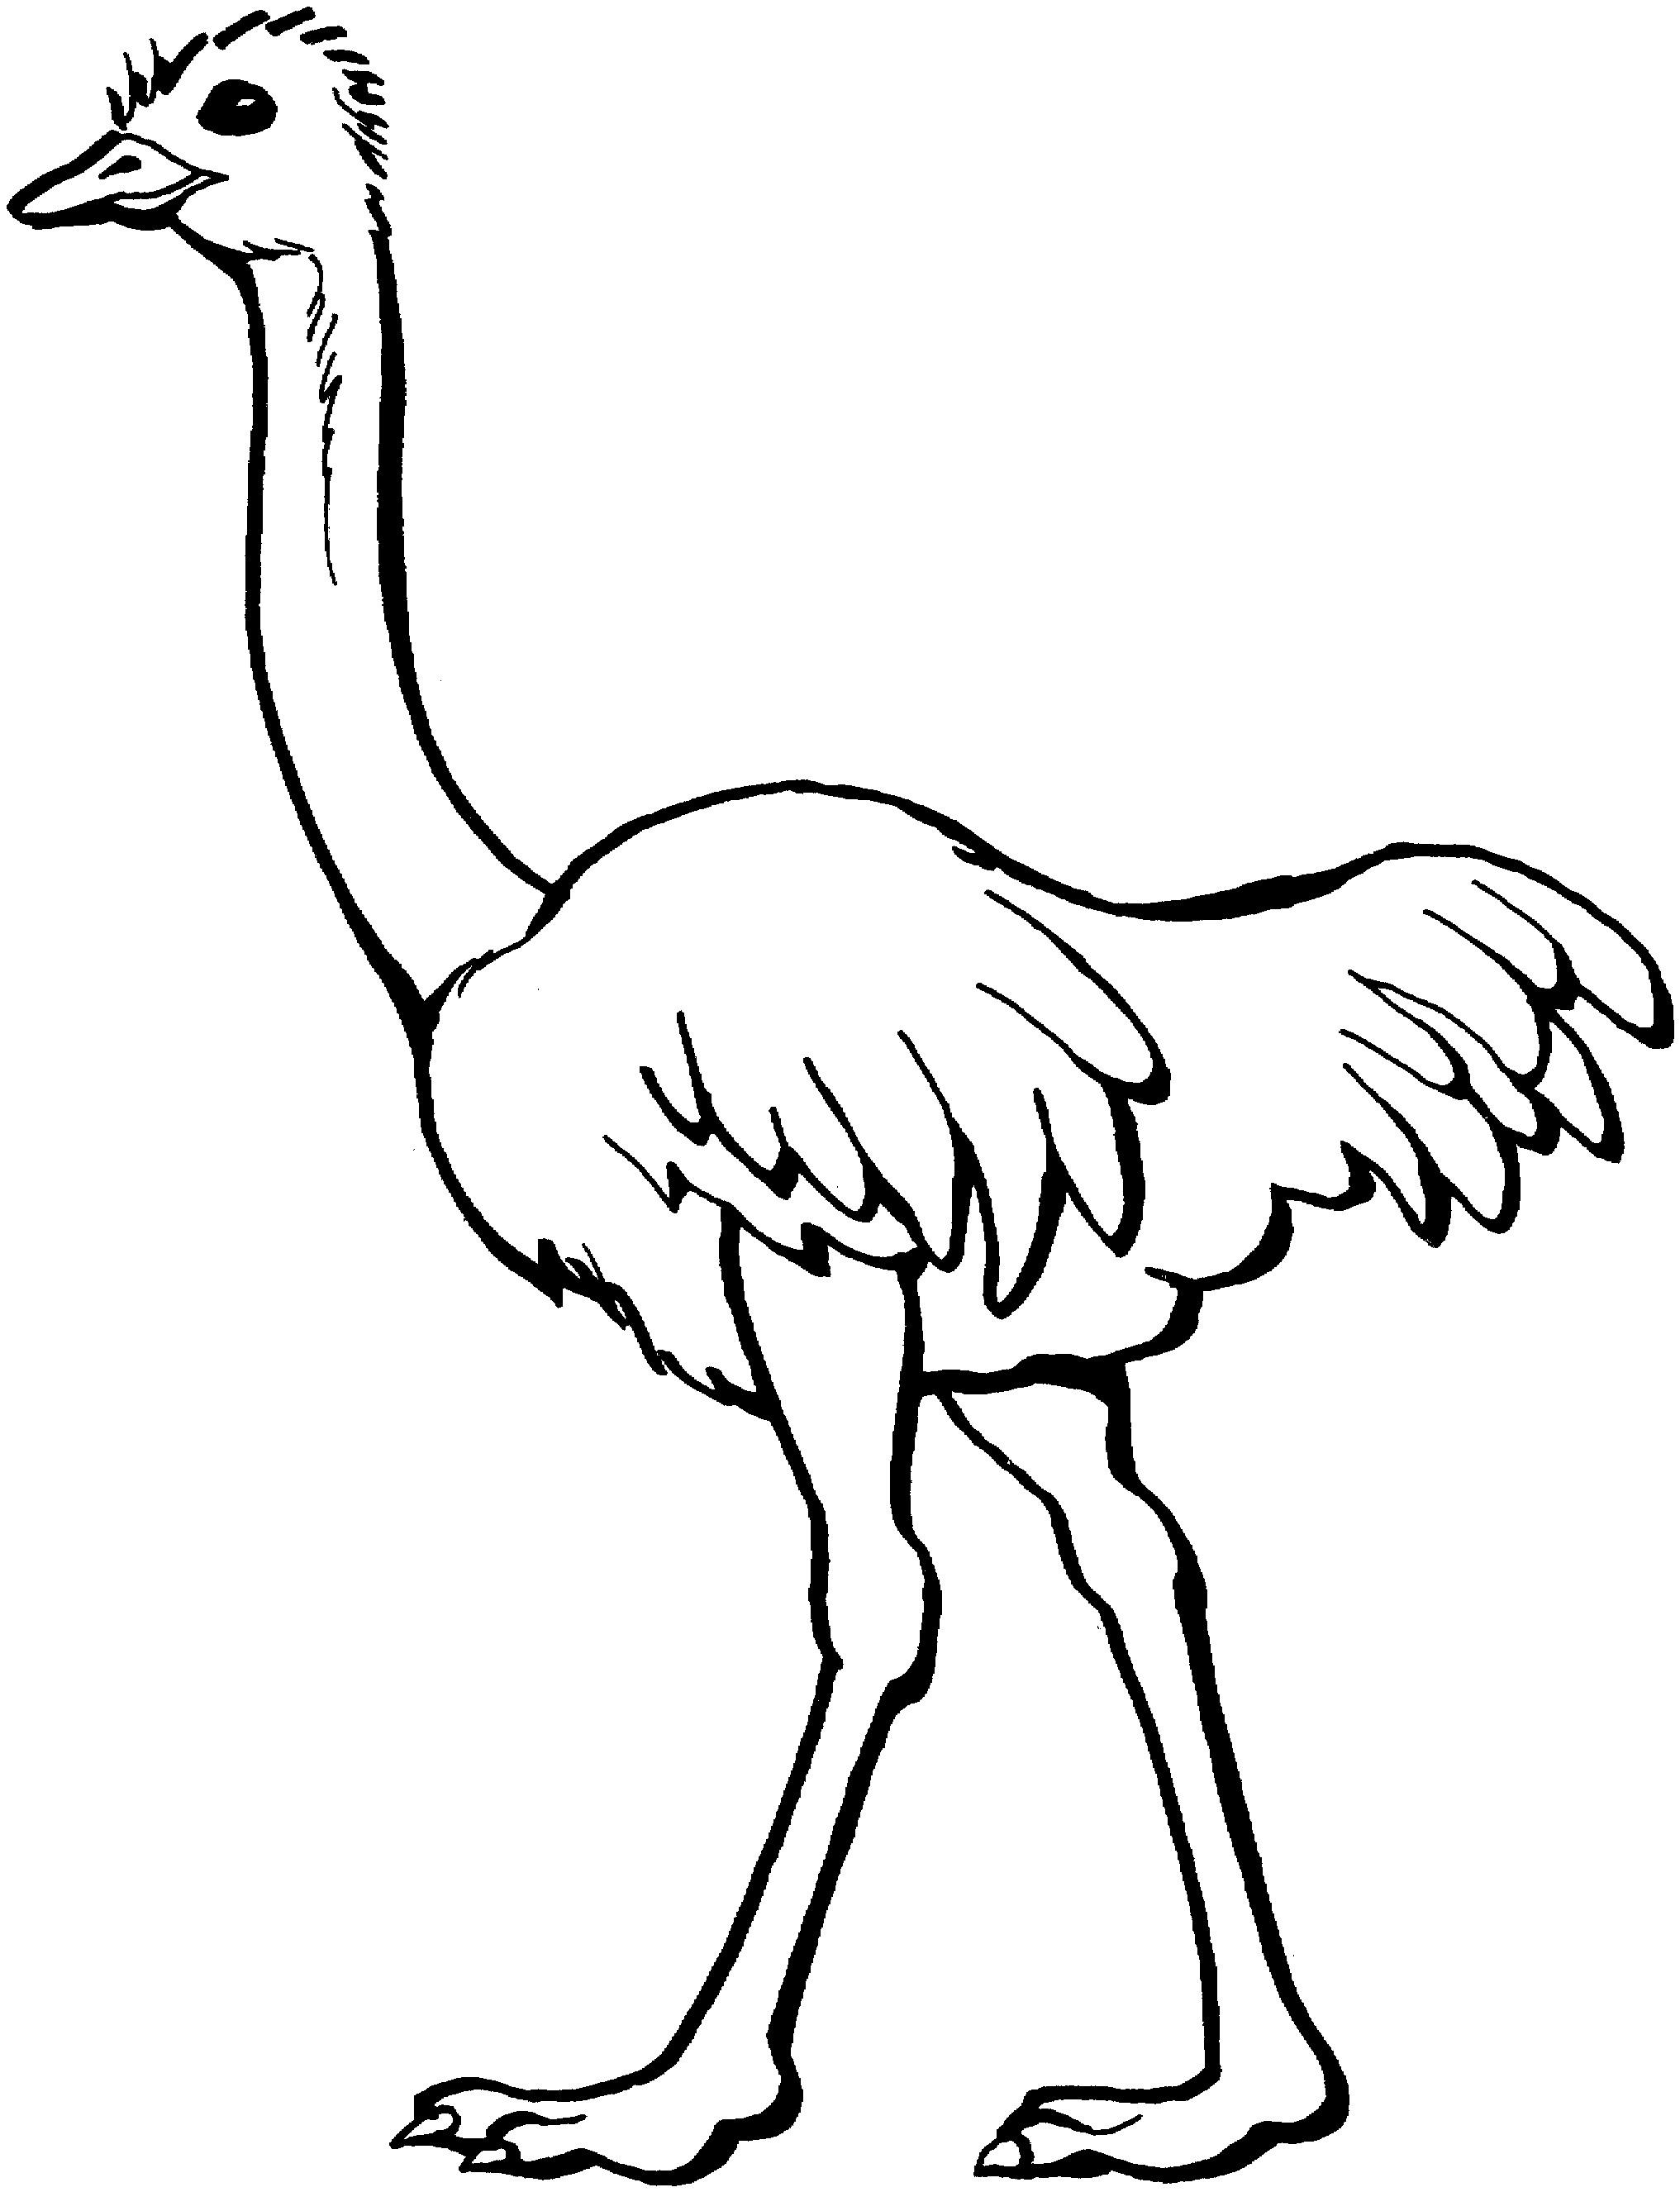 avestruz para colorear 🥇 𝐃𝐢𝐛𝐮𝐣𝐨𝐬 𝐩𝐚𝐫𝐚 𝐢𝐦𝐩𝐫𝐢𝐦𝐢𝐫